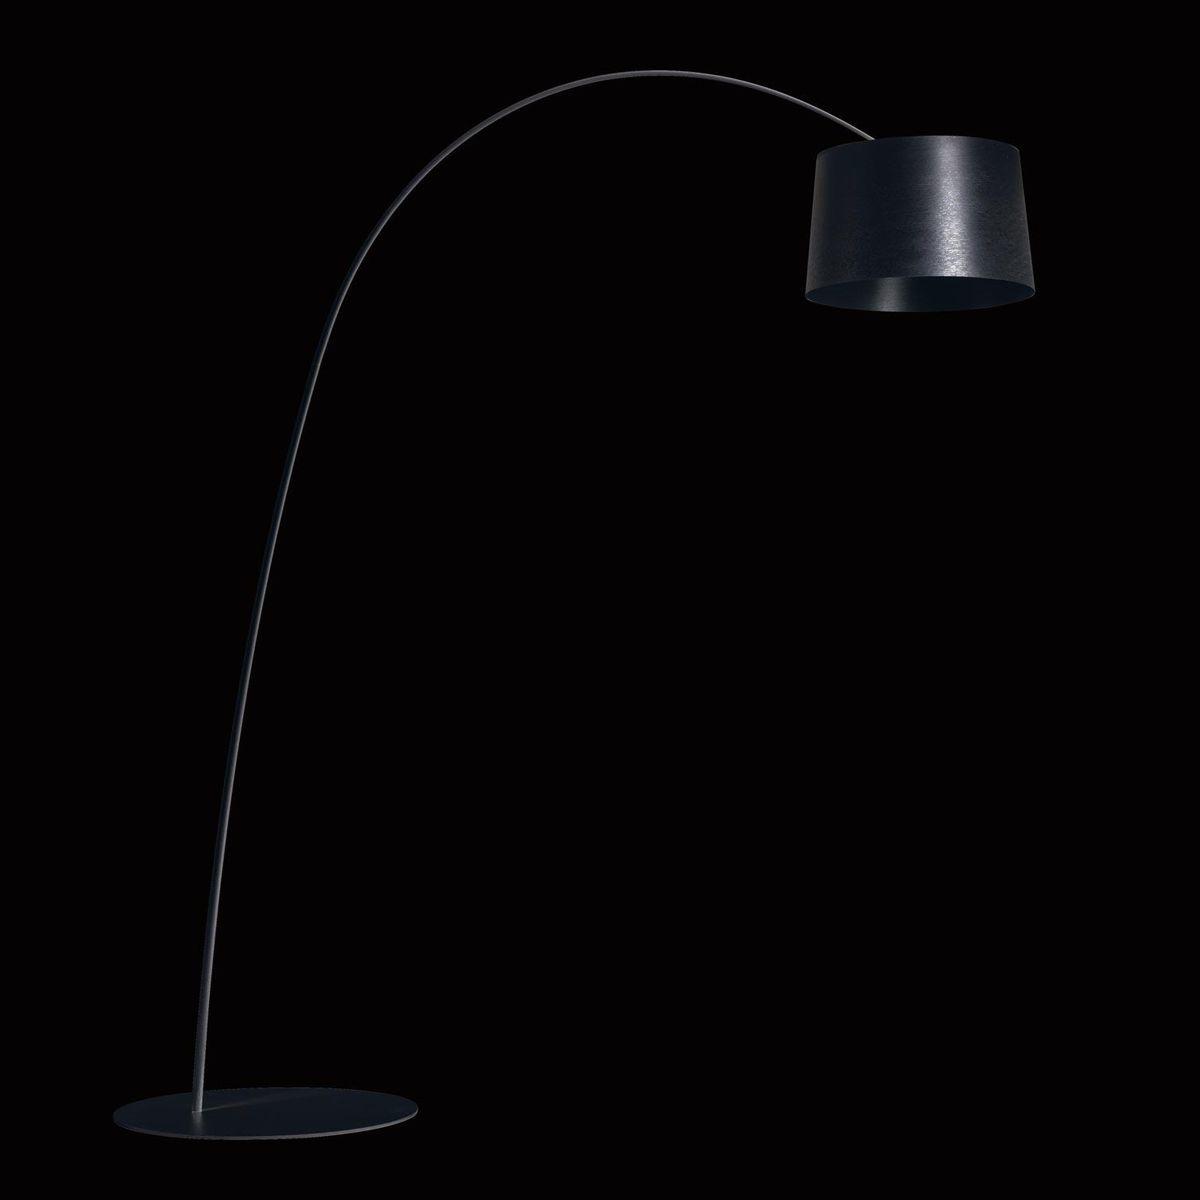 twiggy led floor lamp foscarini. Black Bedroom Furniture Sets. Home Design Ideas